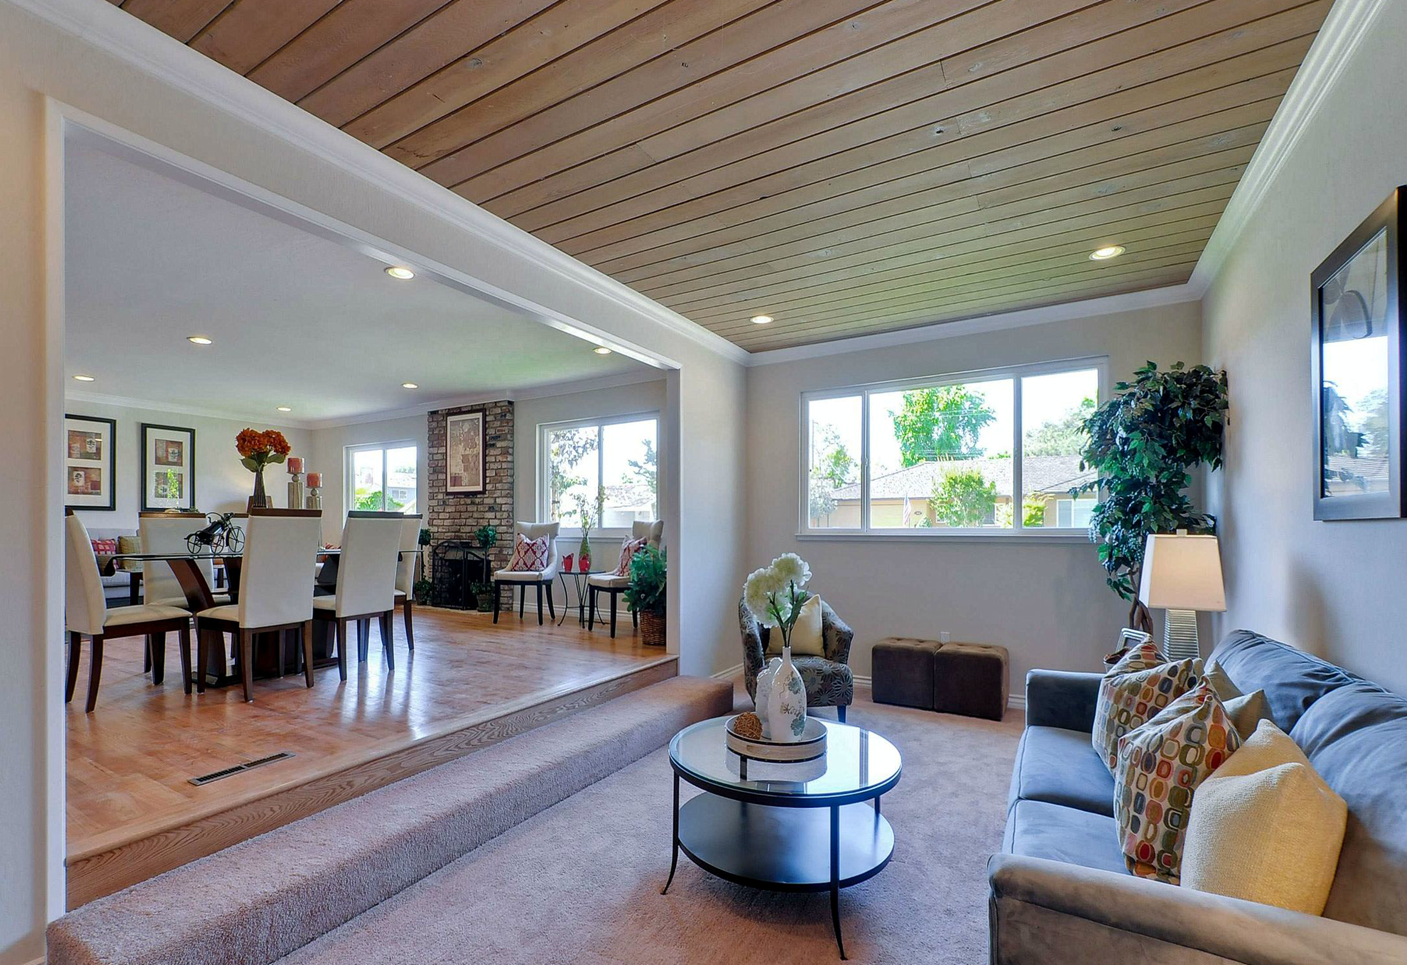 interior painting colors for modern scheme benjamin moore. Black Bedroom Furniture Sets. Home Design Ideas